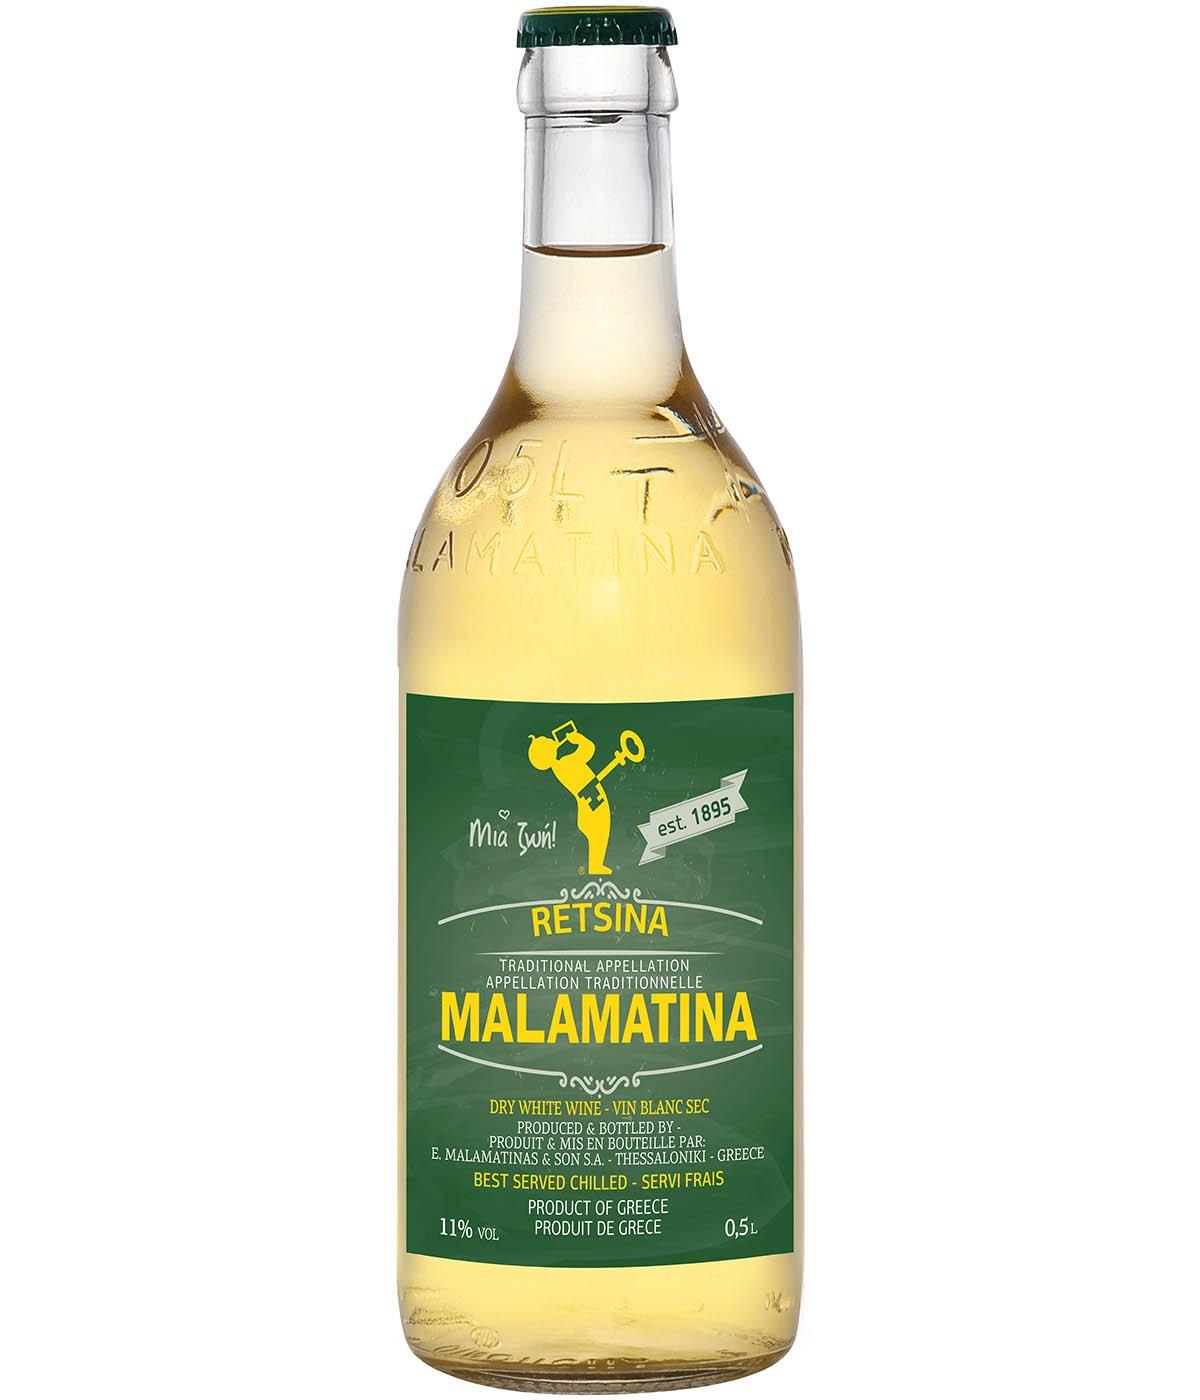 Retsina Malamatina 500 ml Vitt Vin